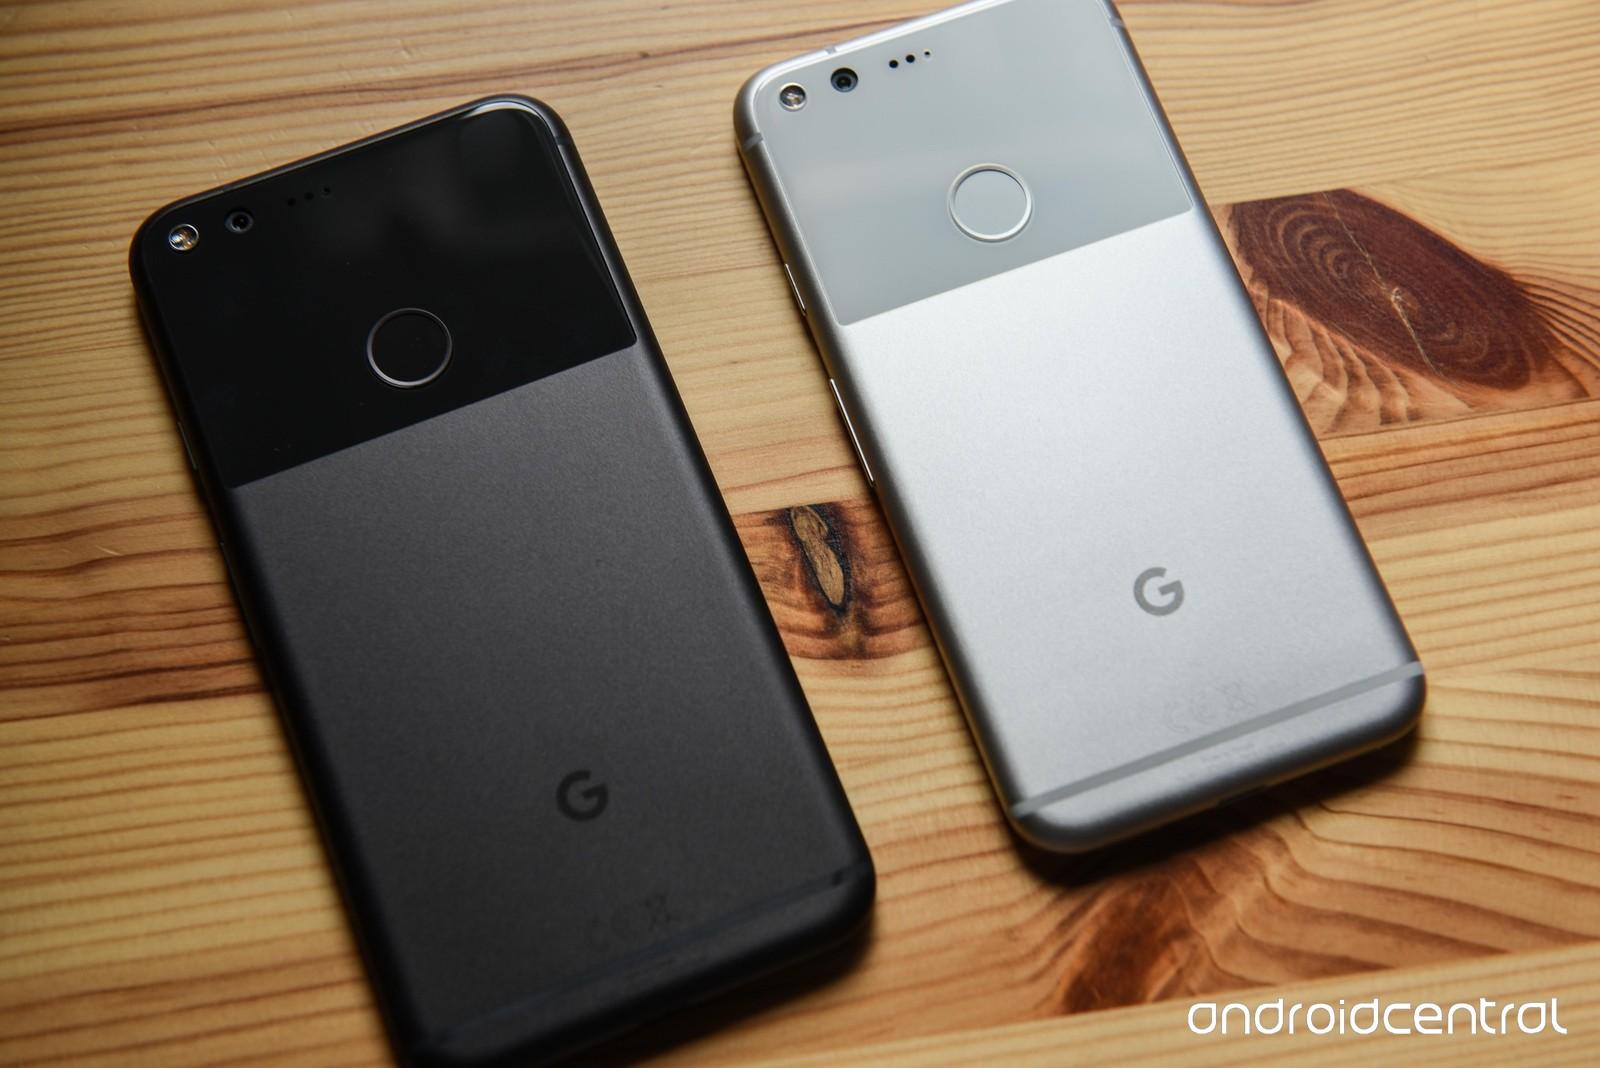 Google Pixel XL 2 video concept